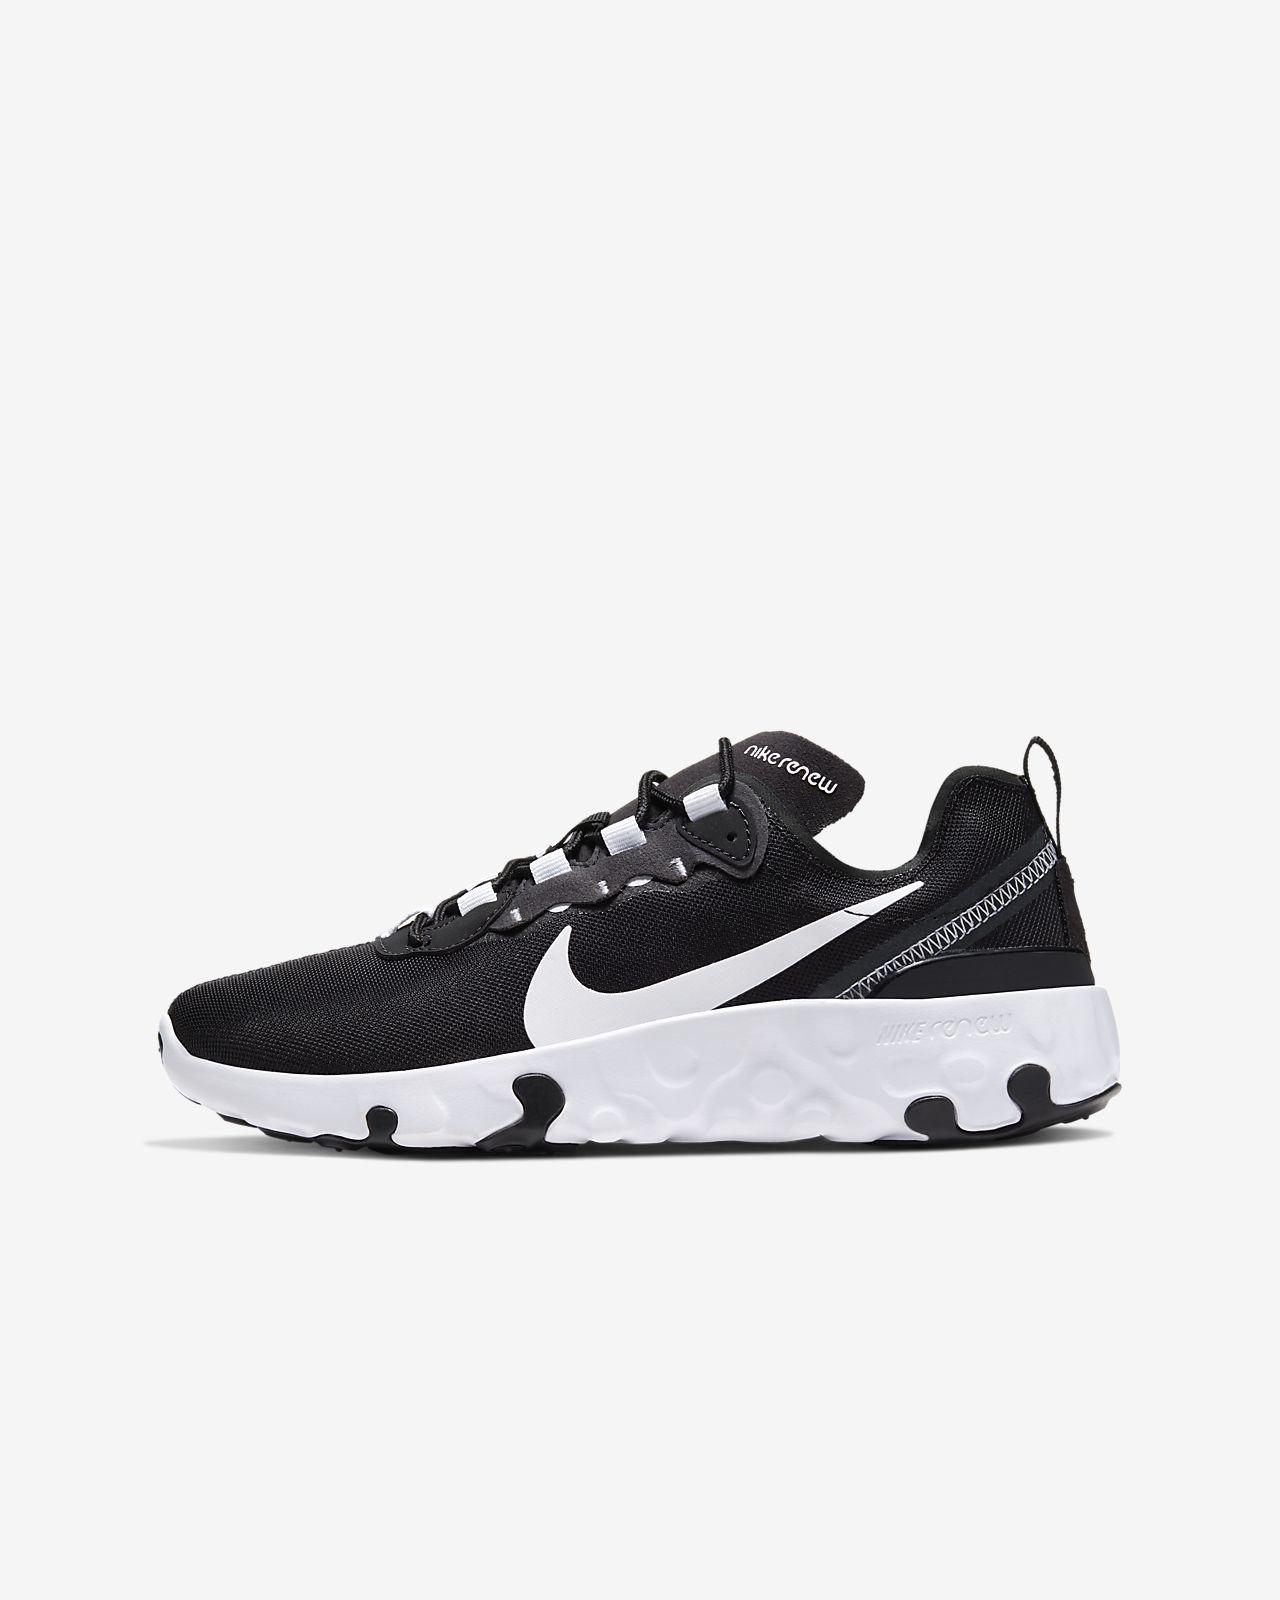 48.00 Nike Element 3.0 12 Zip Top Obsidian Mens